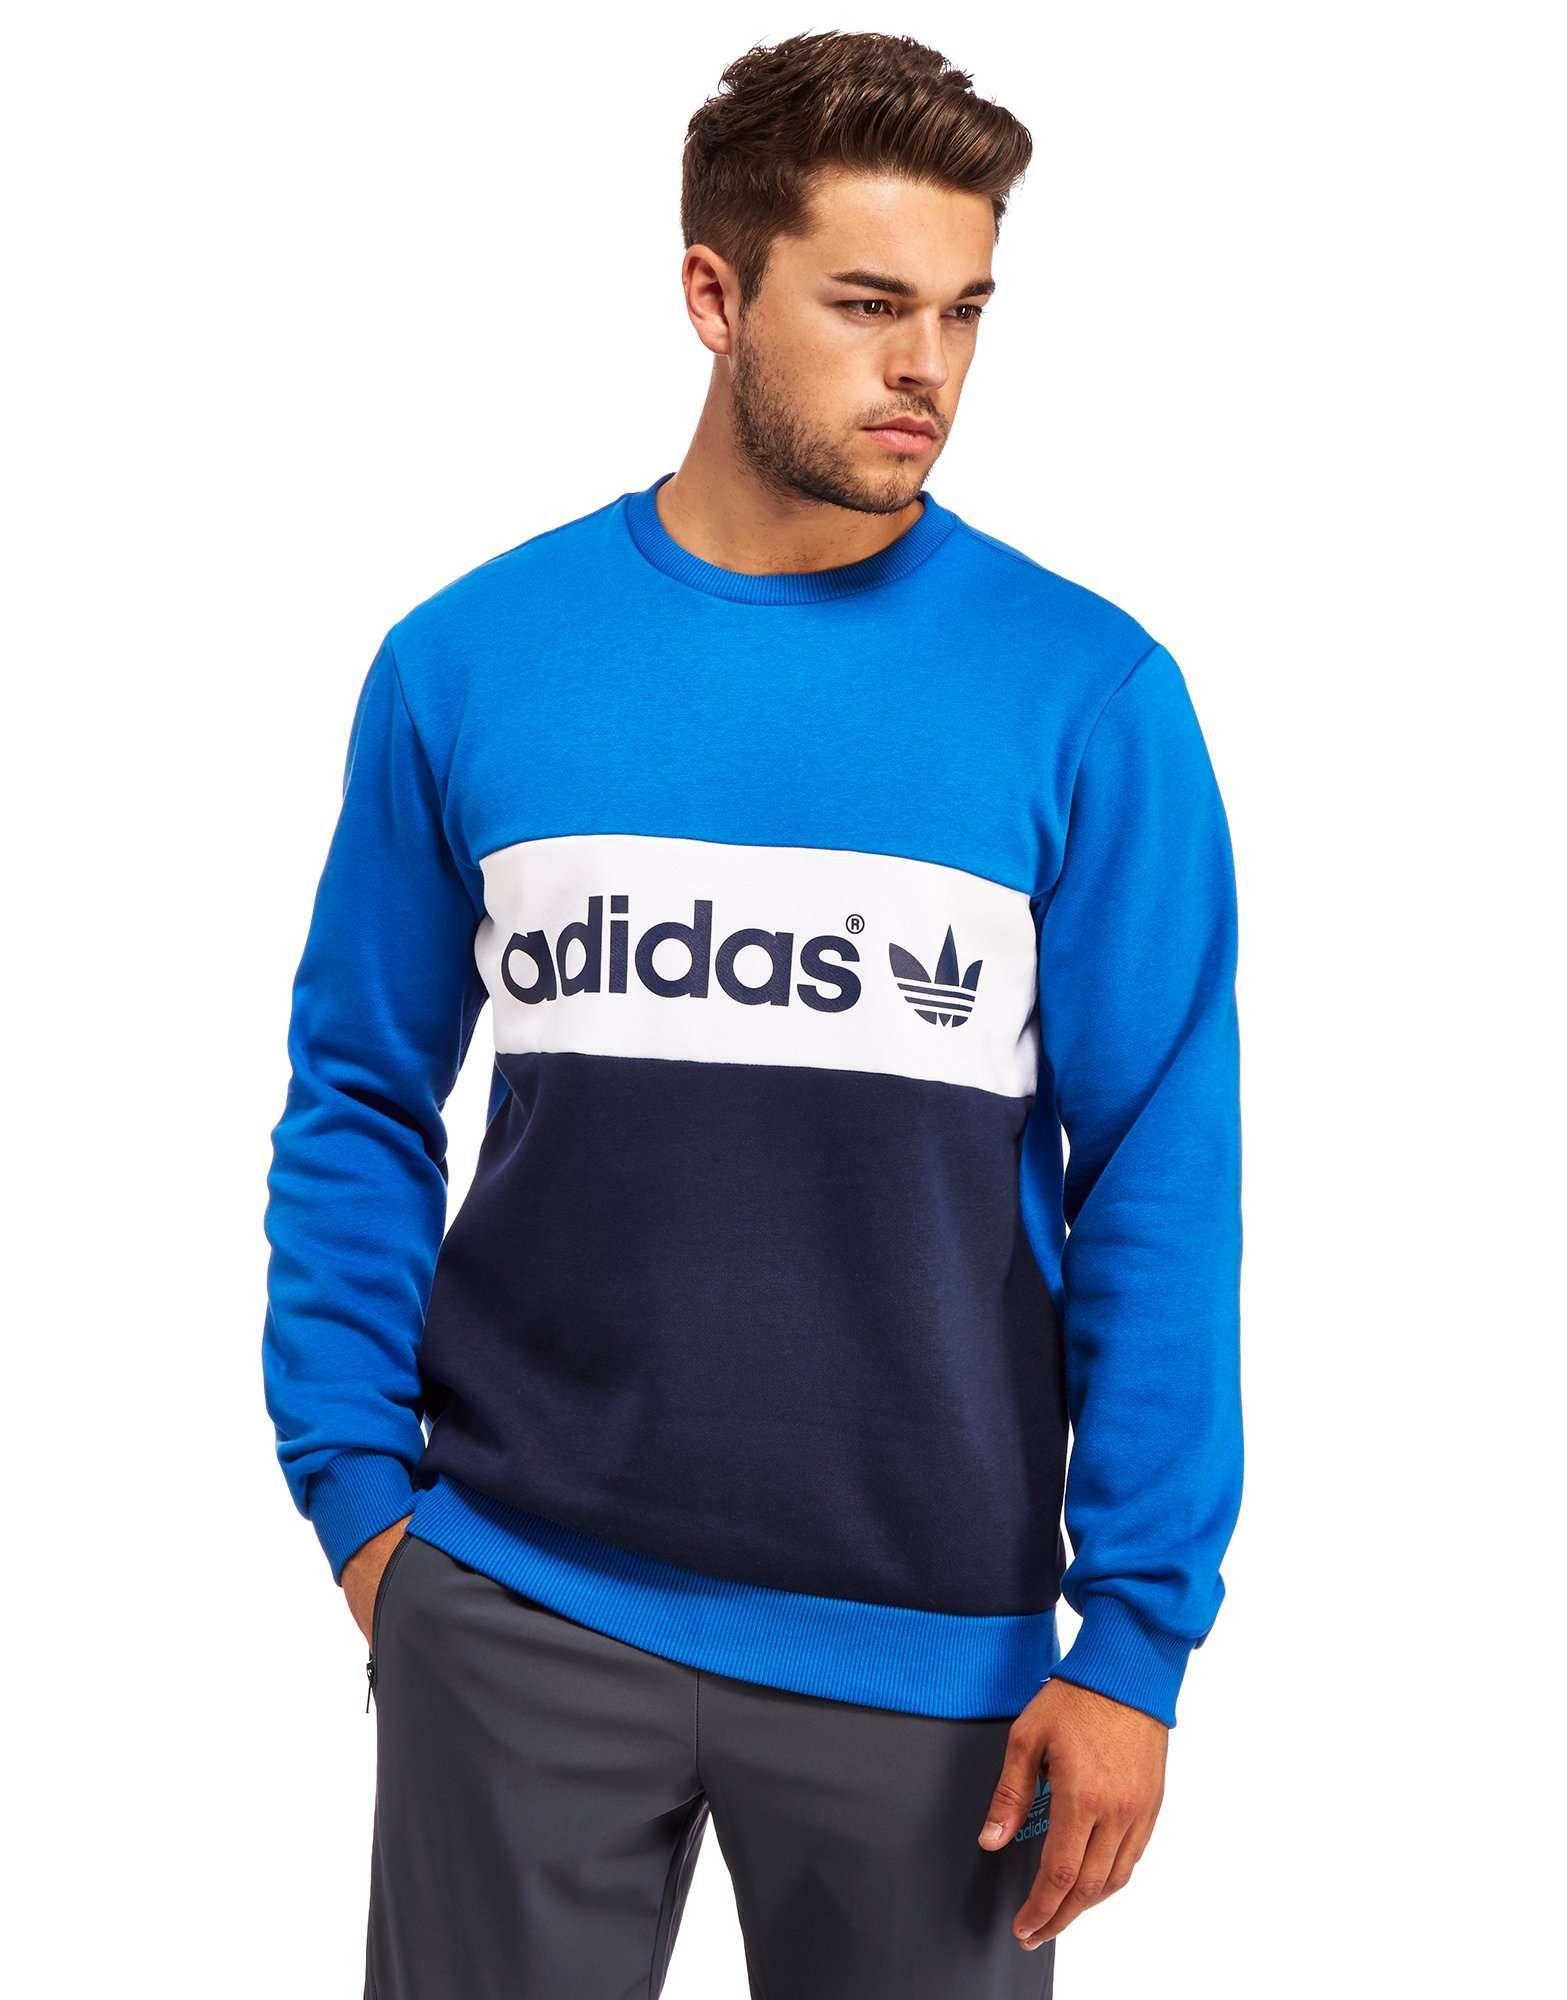 adidas Originals Linear Sweatshirt Shop online for